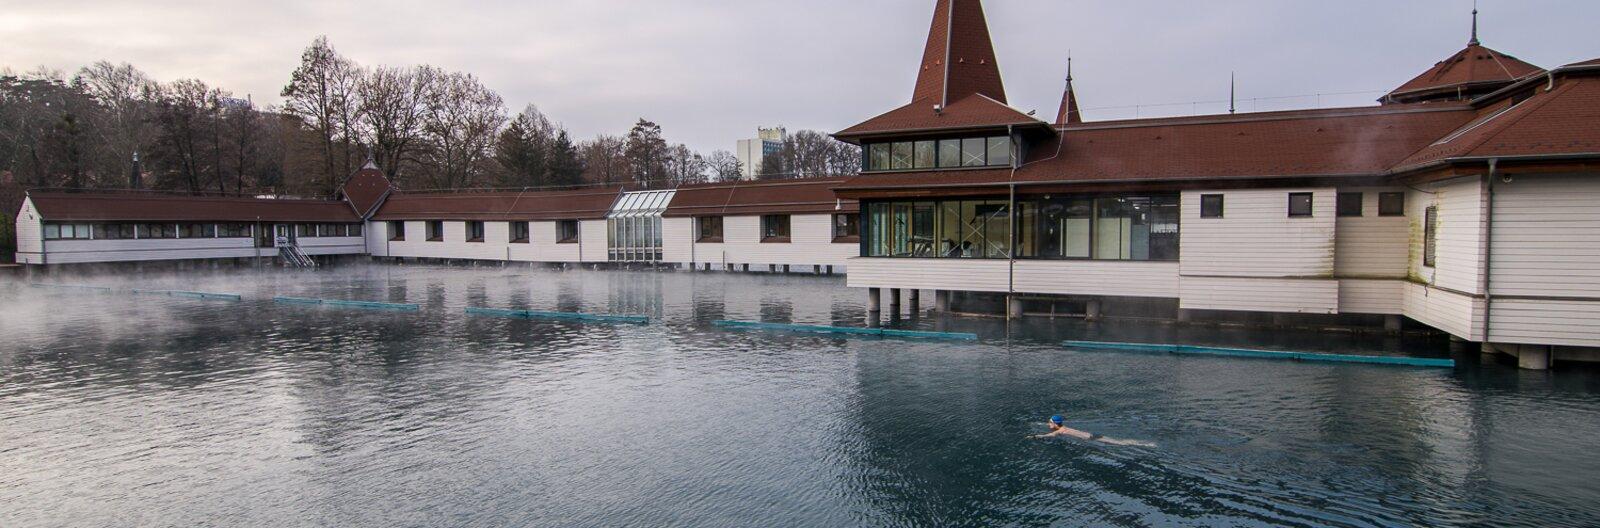 10 best things to do at Lake Balaton this autumn